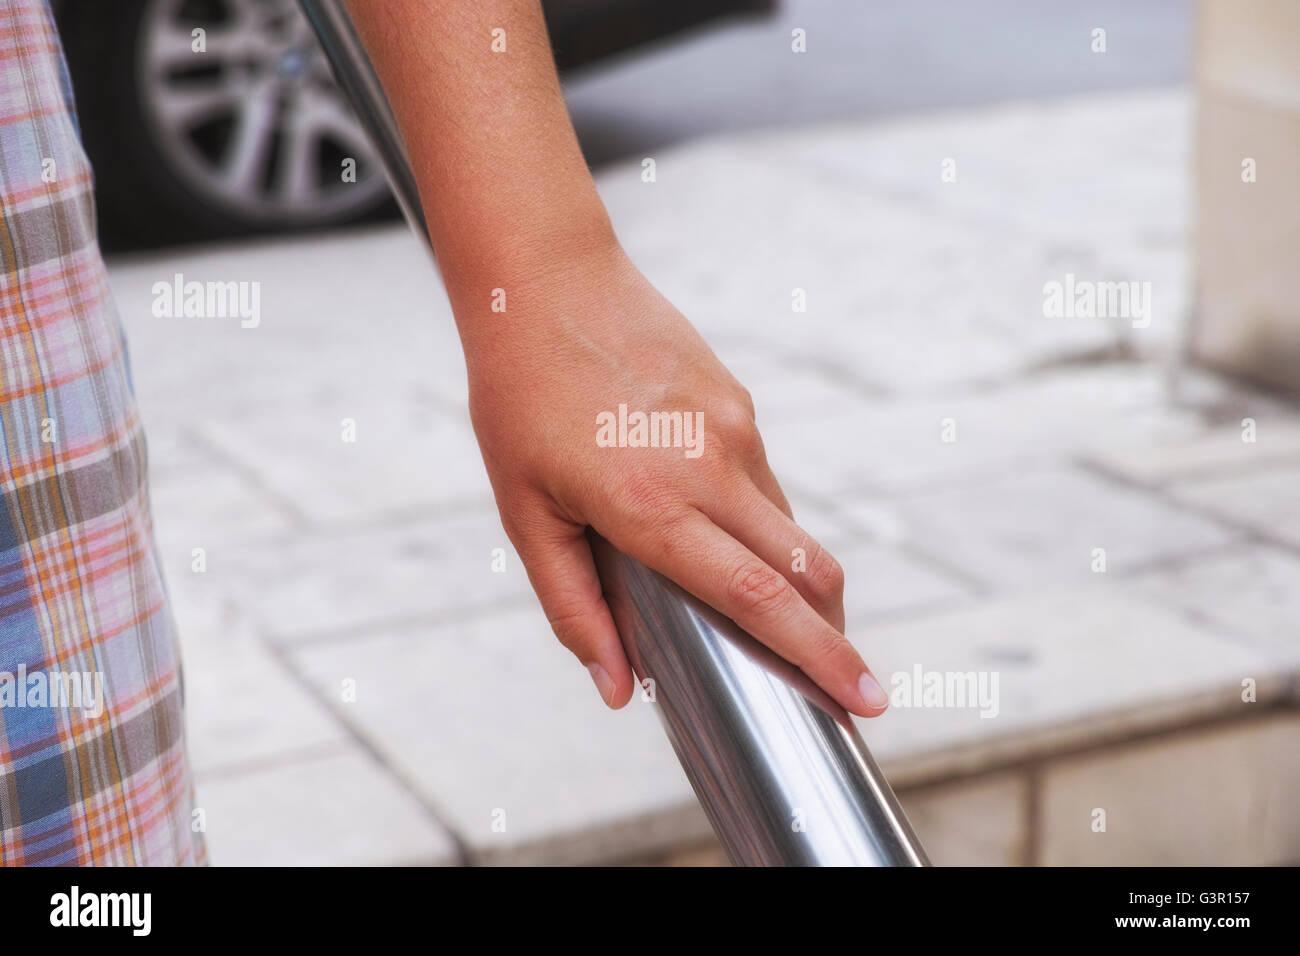 Woman hand using handrail. Urban scene. - Stock Image